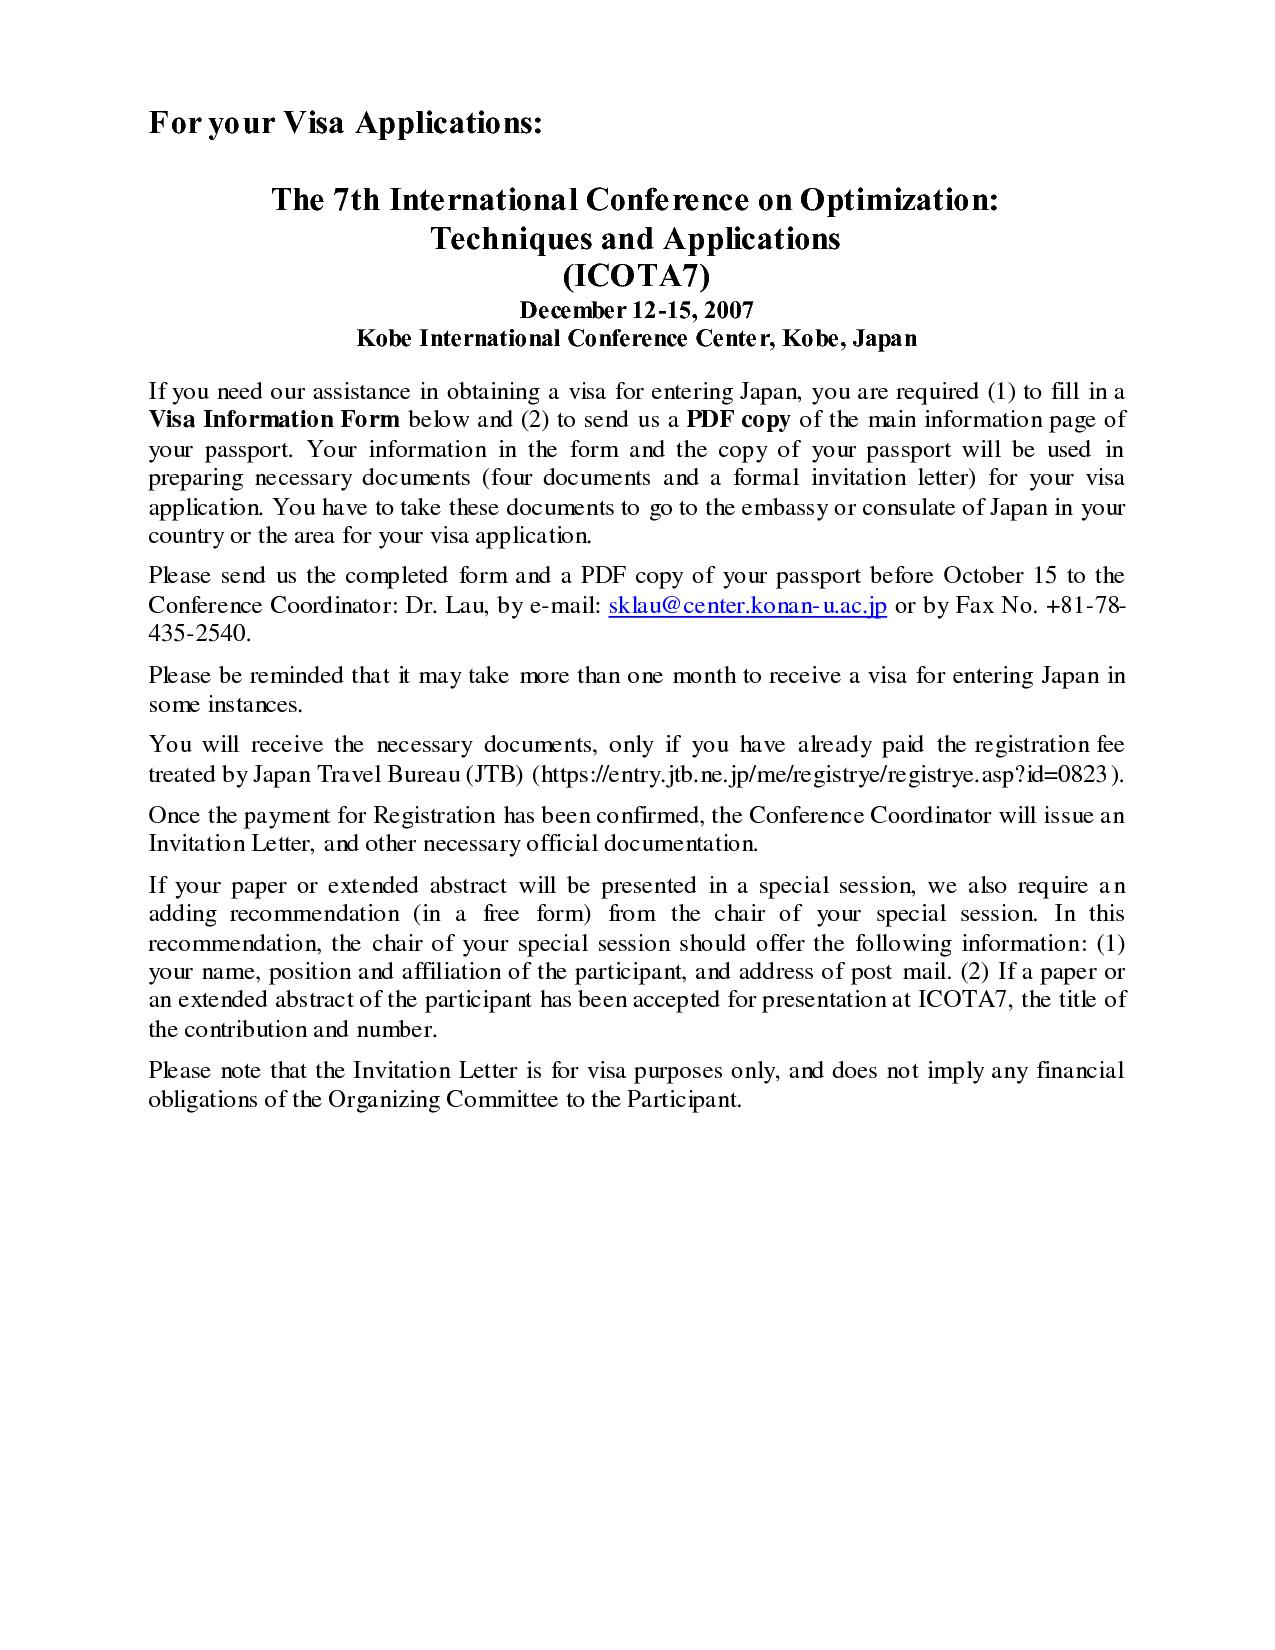 Free Formal Visa InvitationVisa Invitation Letter